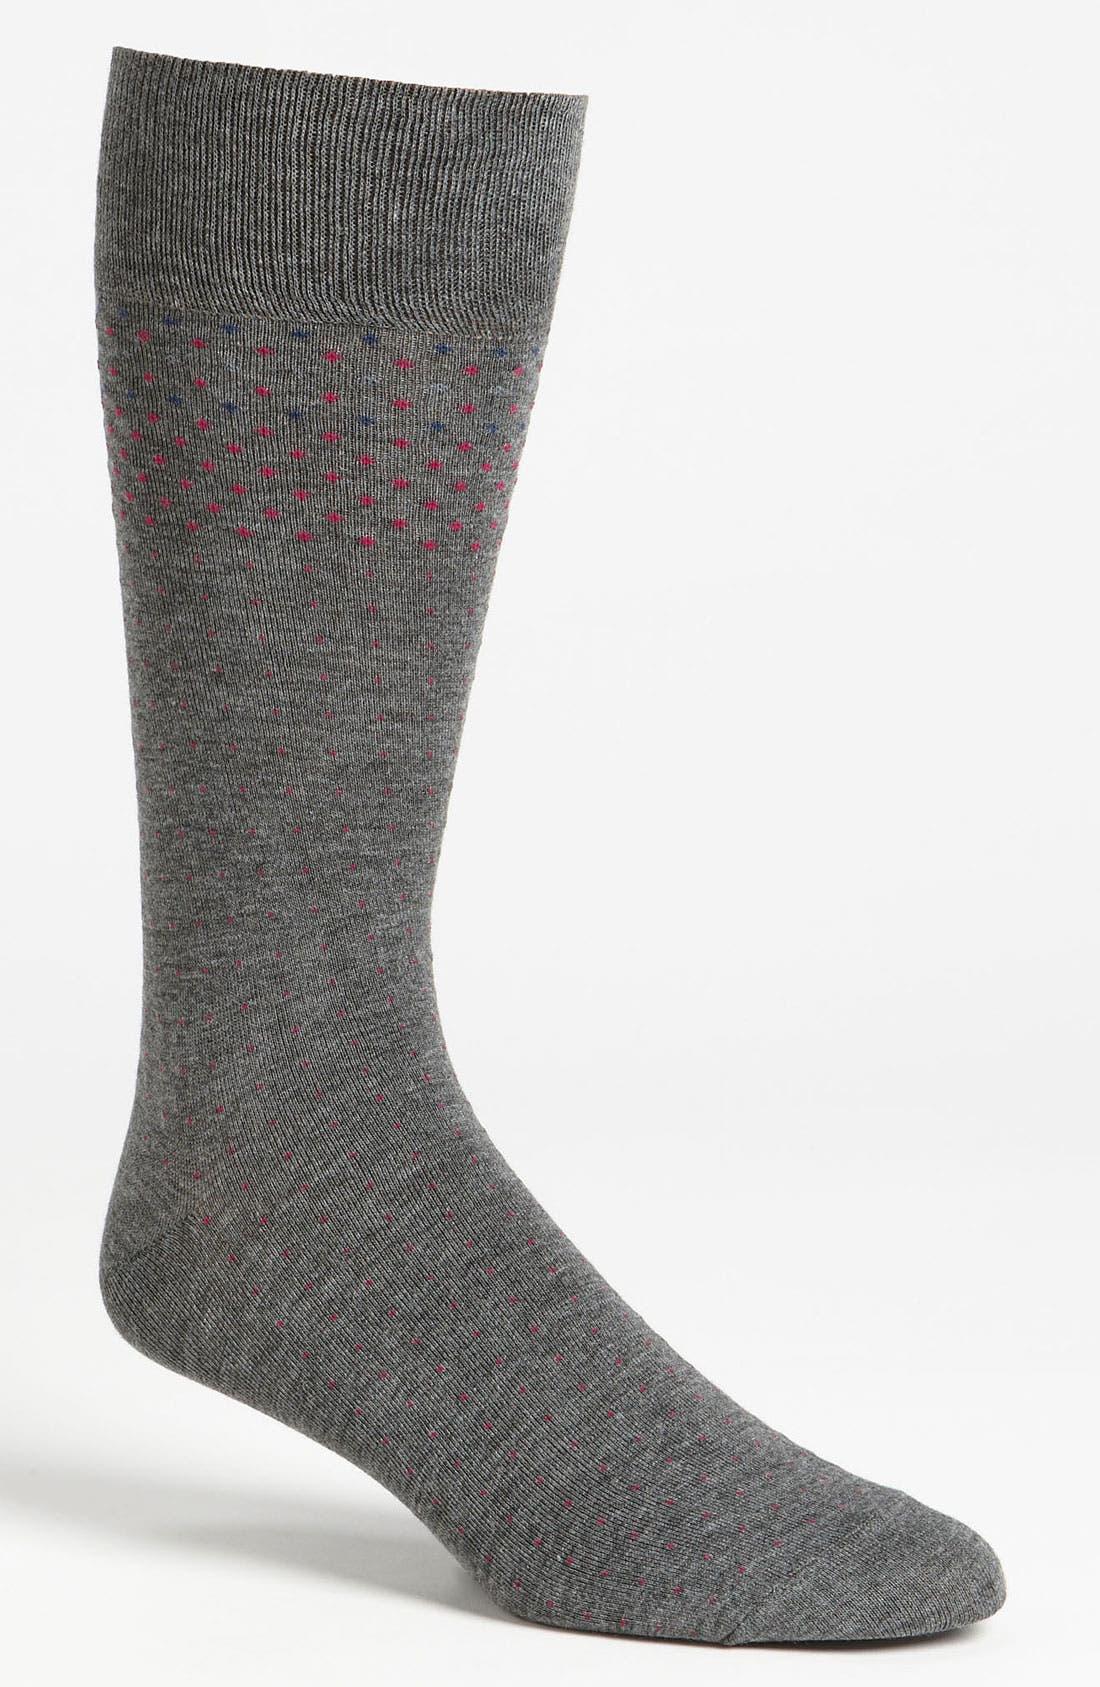 Alternate Image 1 Selected - Vince Camuto 'Graduated Pin Dot' Socks